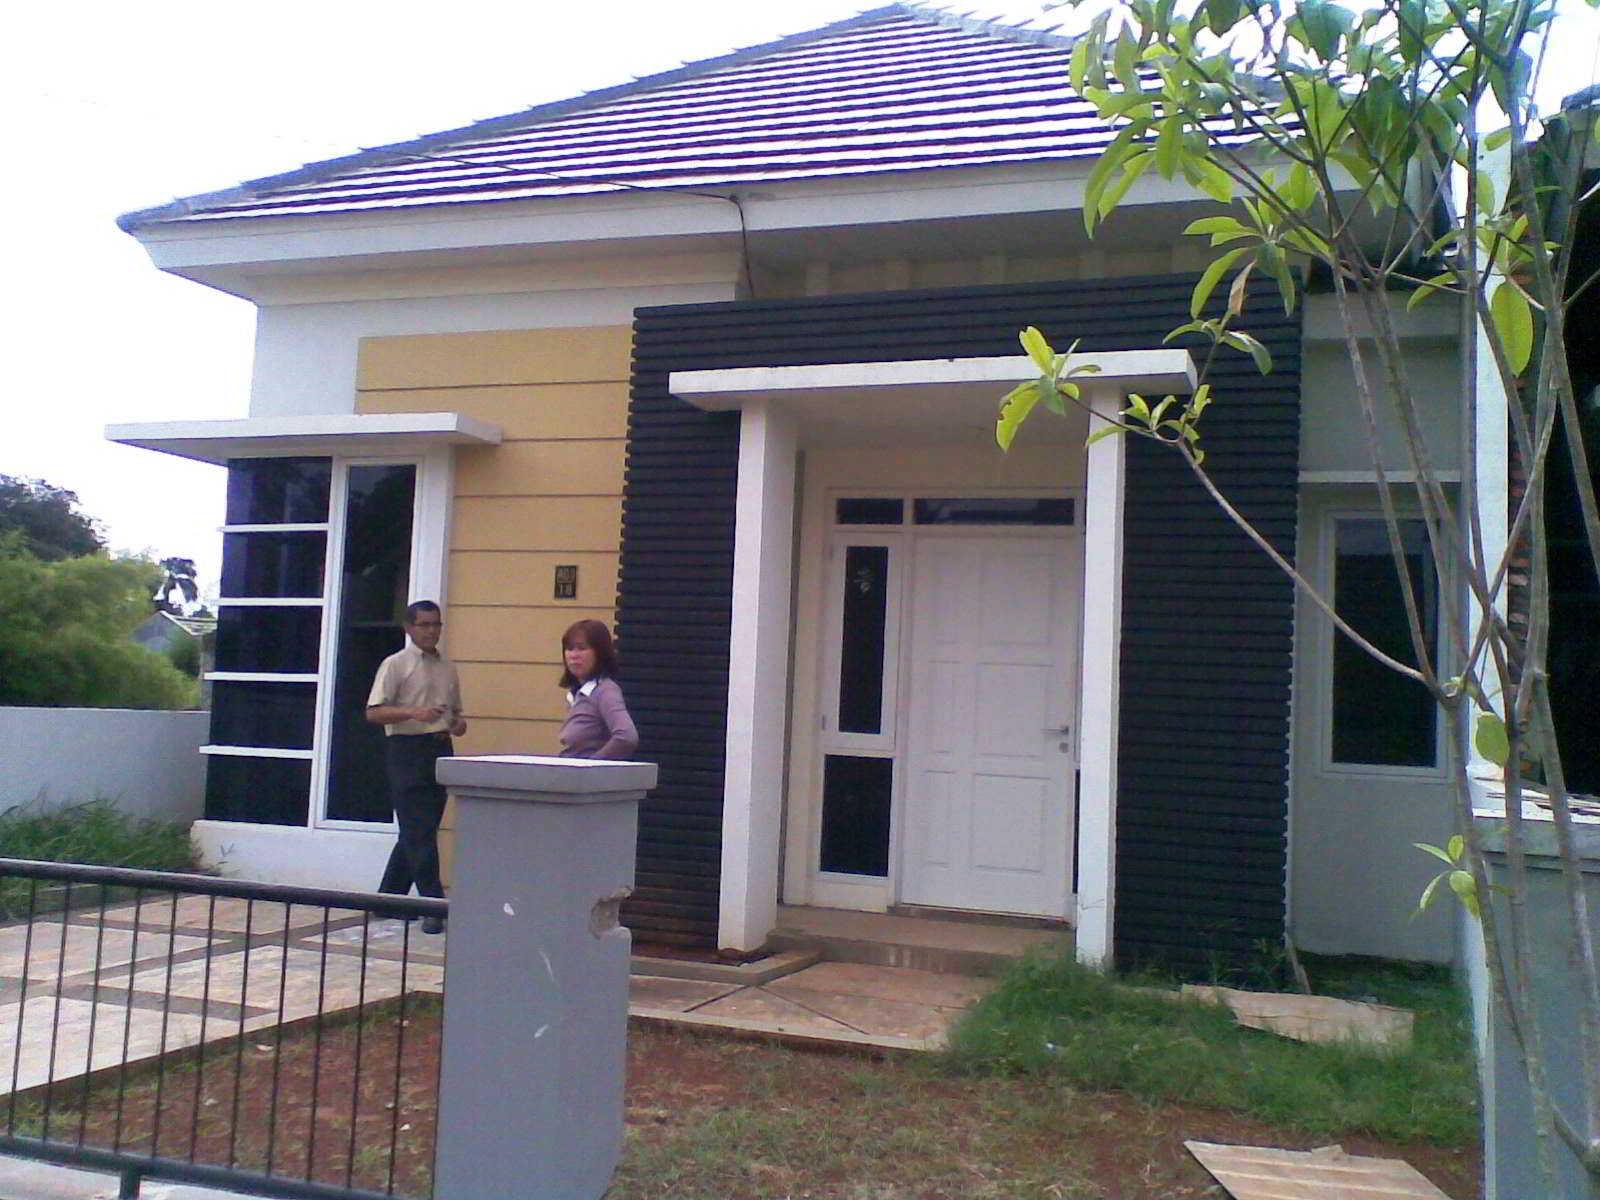 52 desain rumah minimalis tampak depan 1 lantai modern